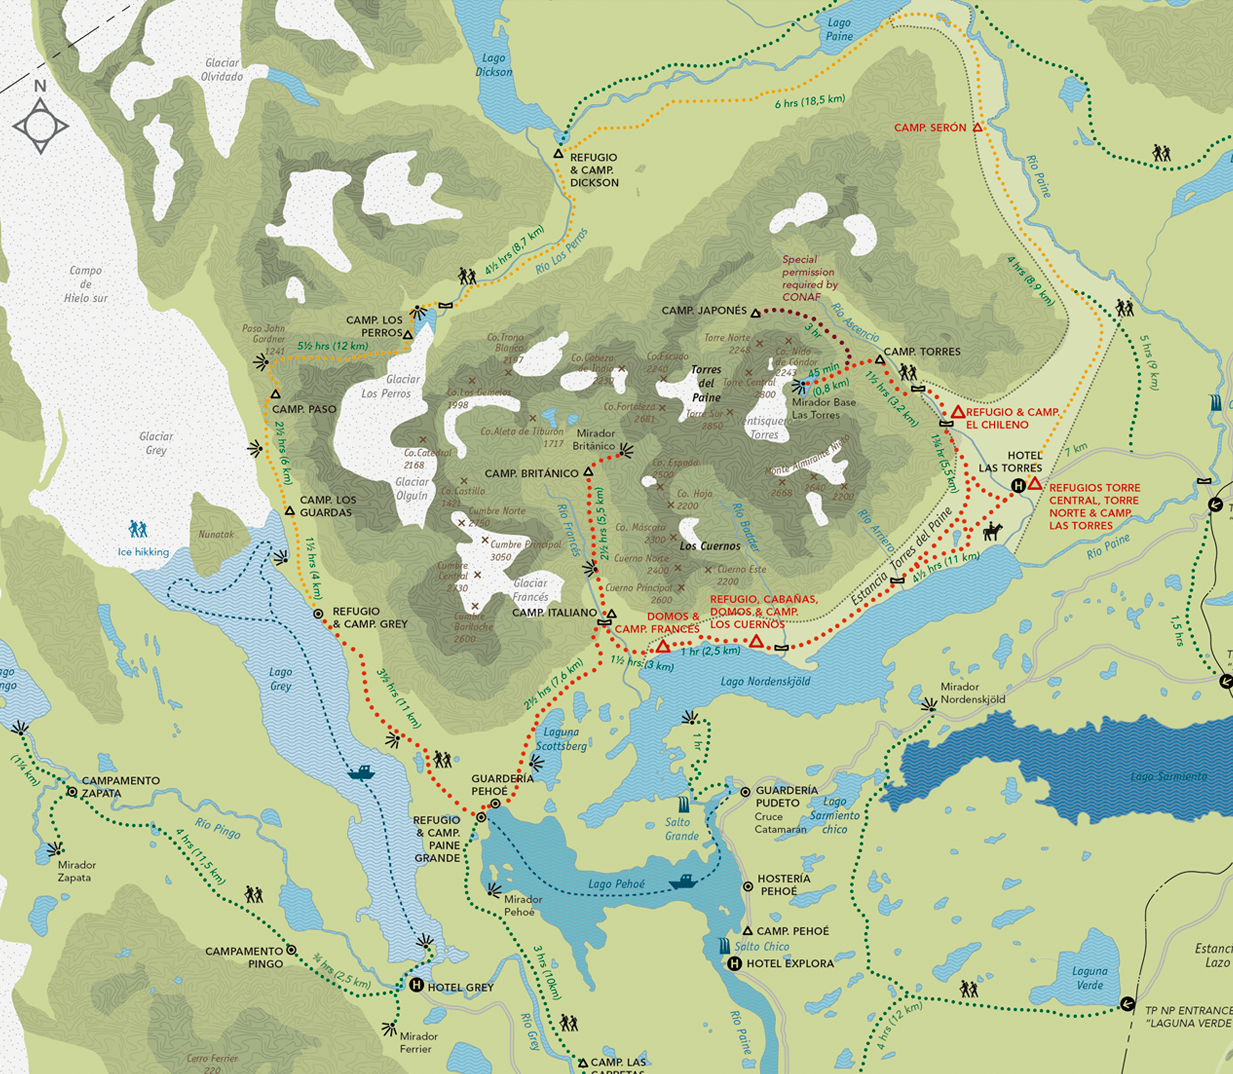 Map by Fantastico Sur